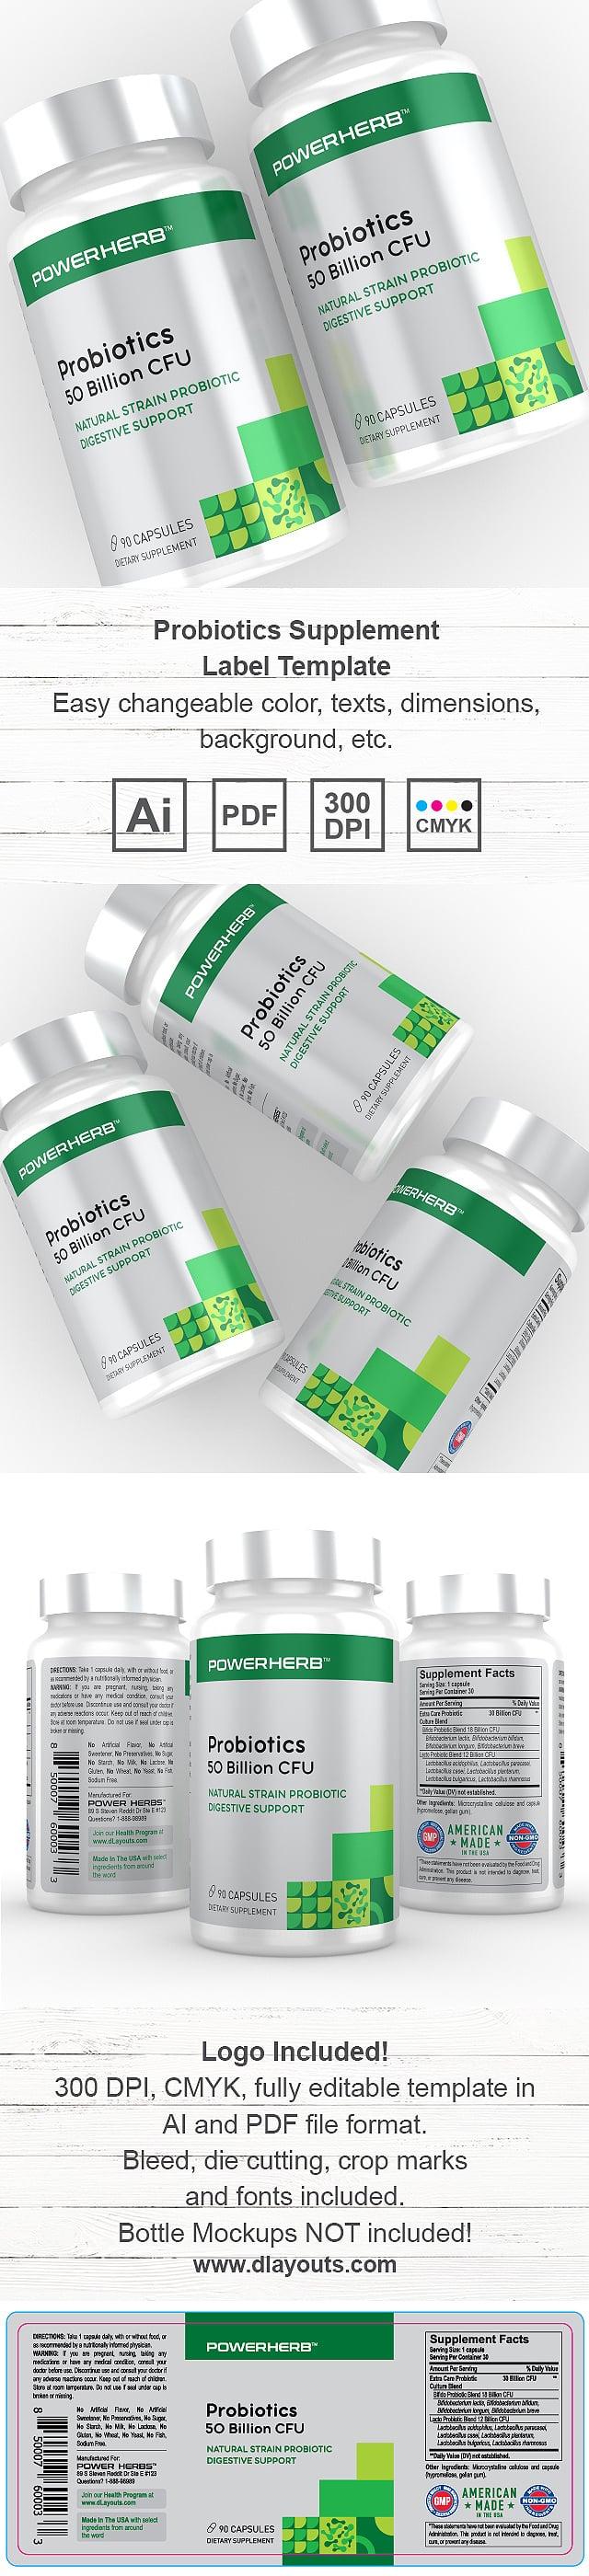 Probiotics Supplement Label Template